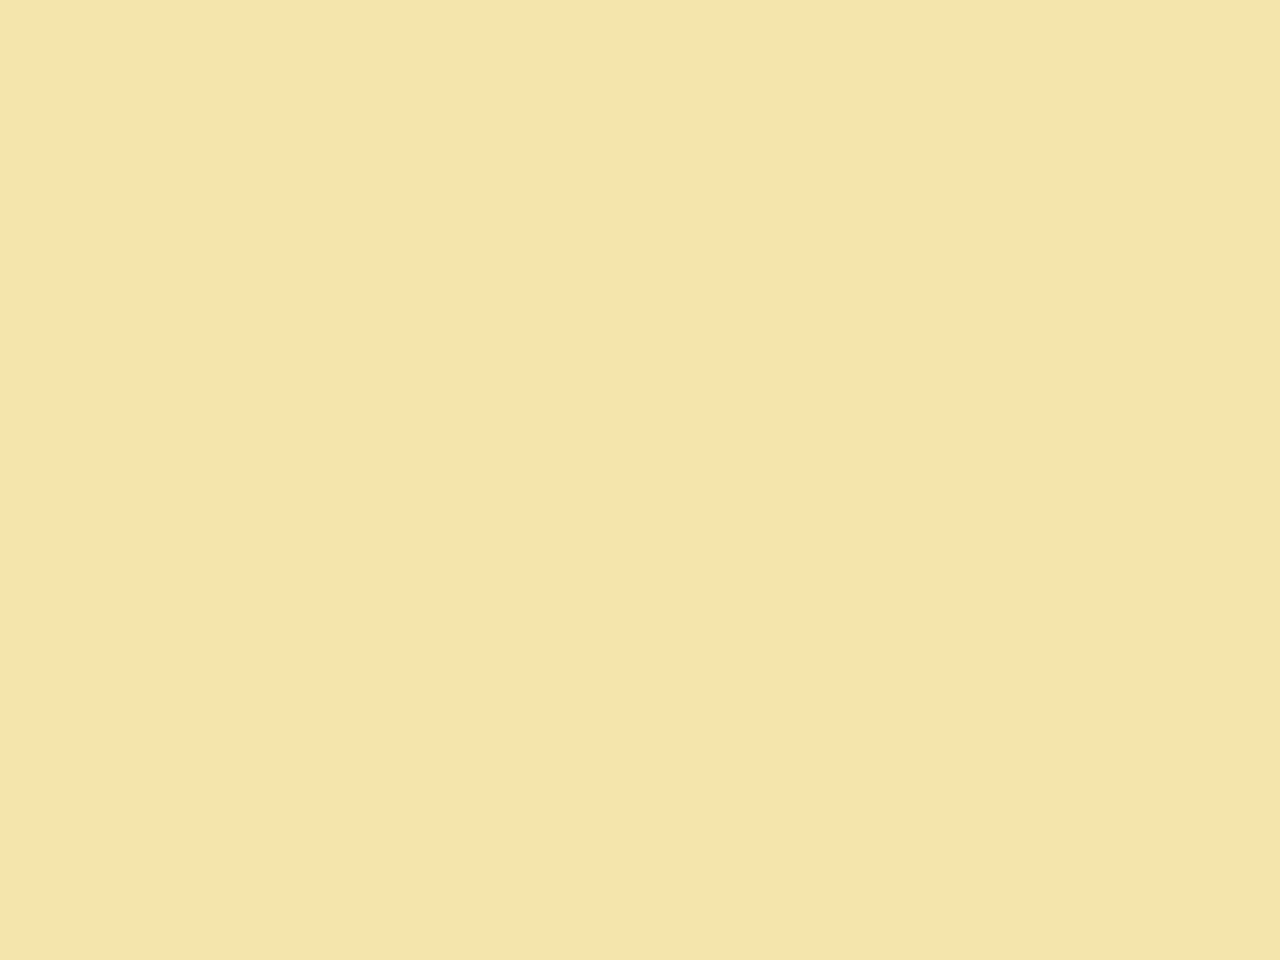 1280x960 Vanilla Solid Color Background